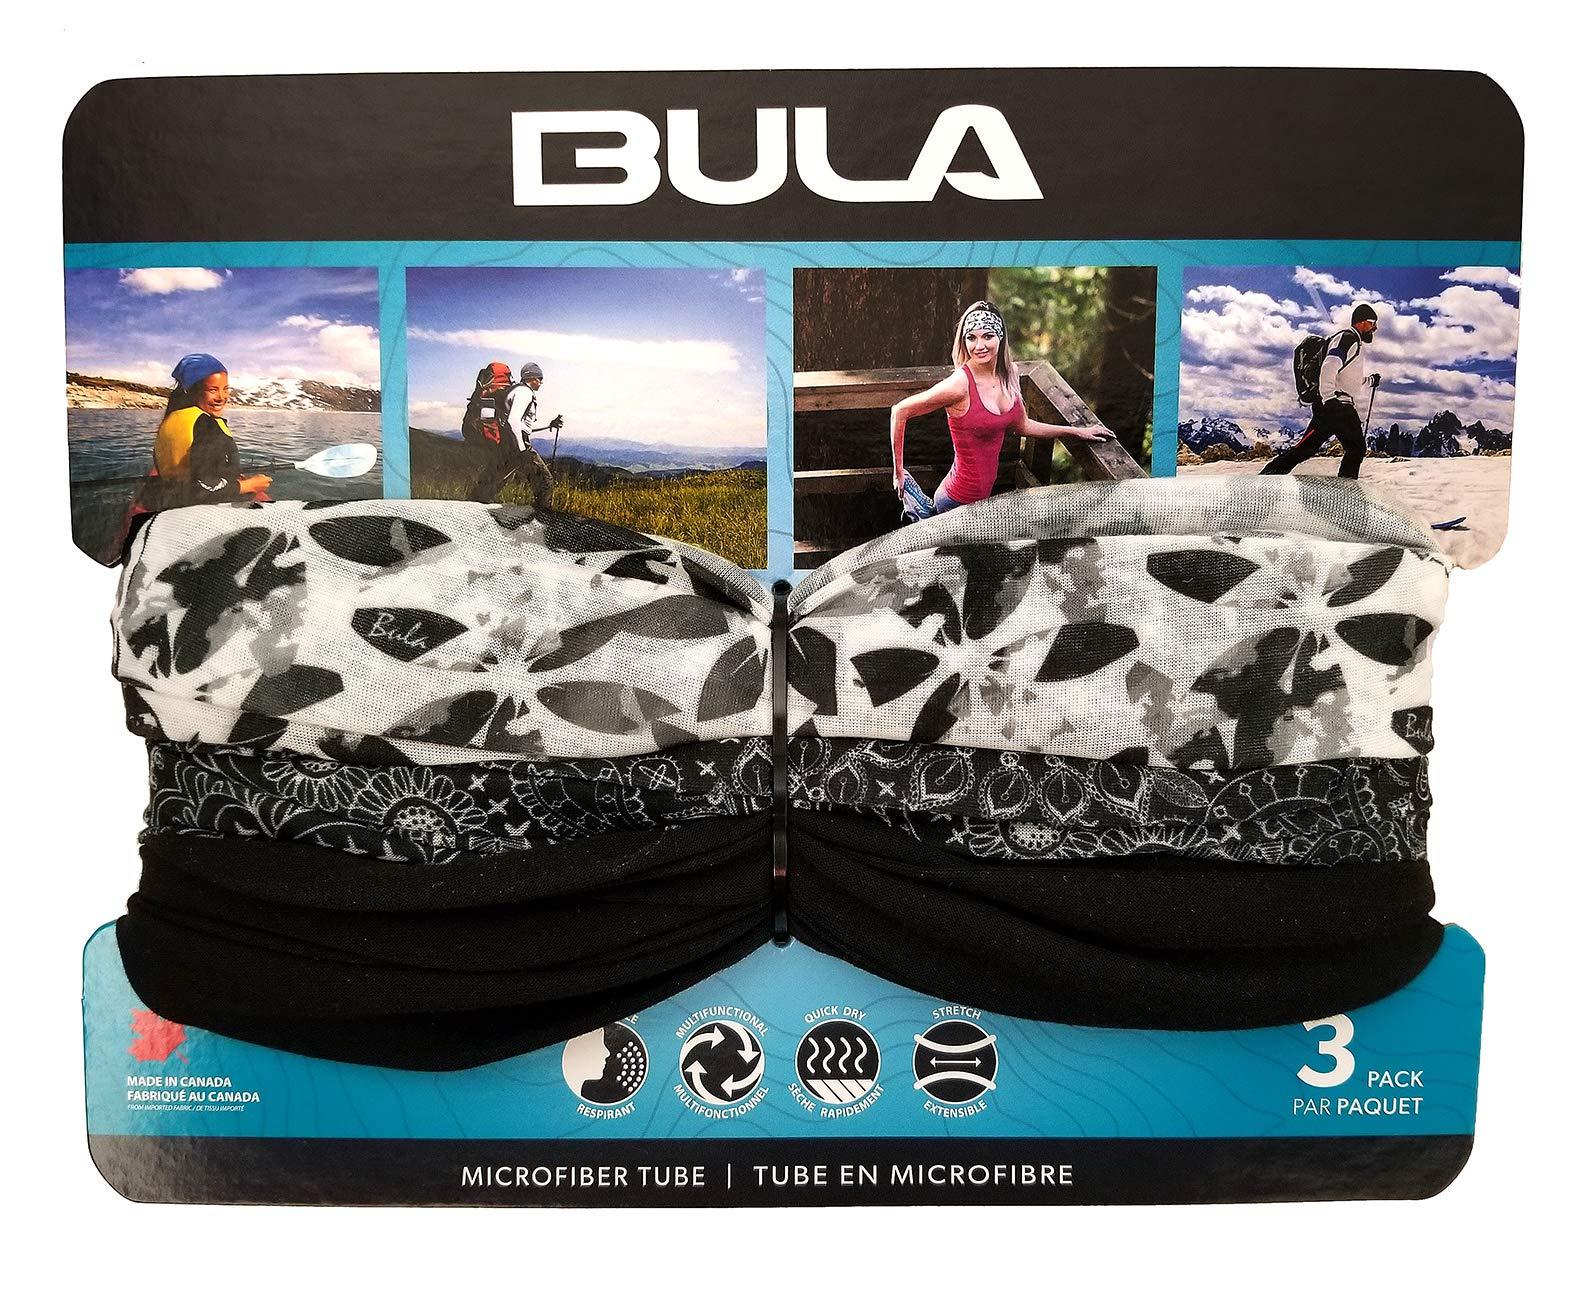 BULA - Unisex Soft Microfiber Multi-Functional Tube (3 Pack) (Black/White) by Bula